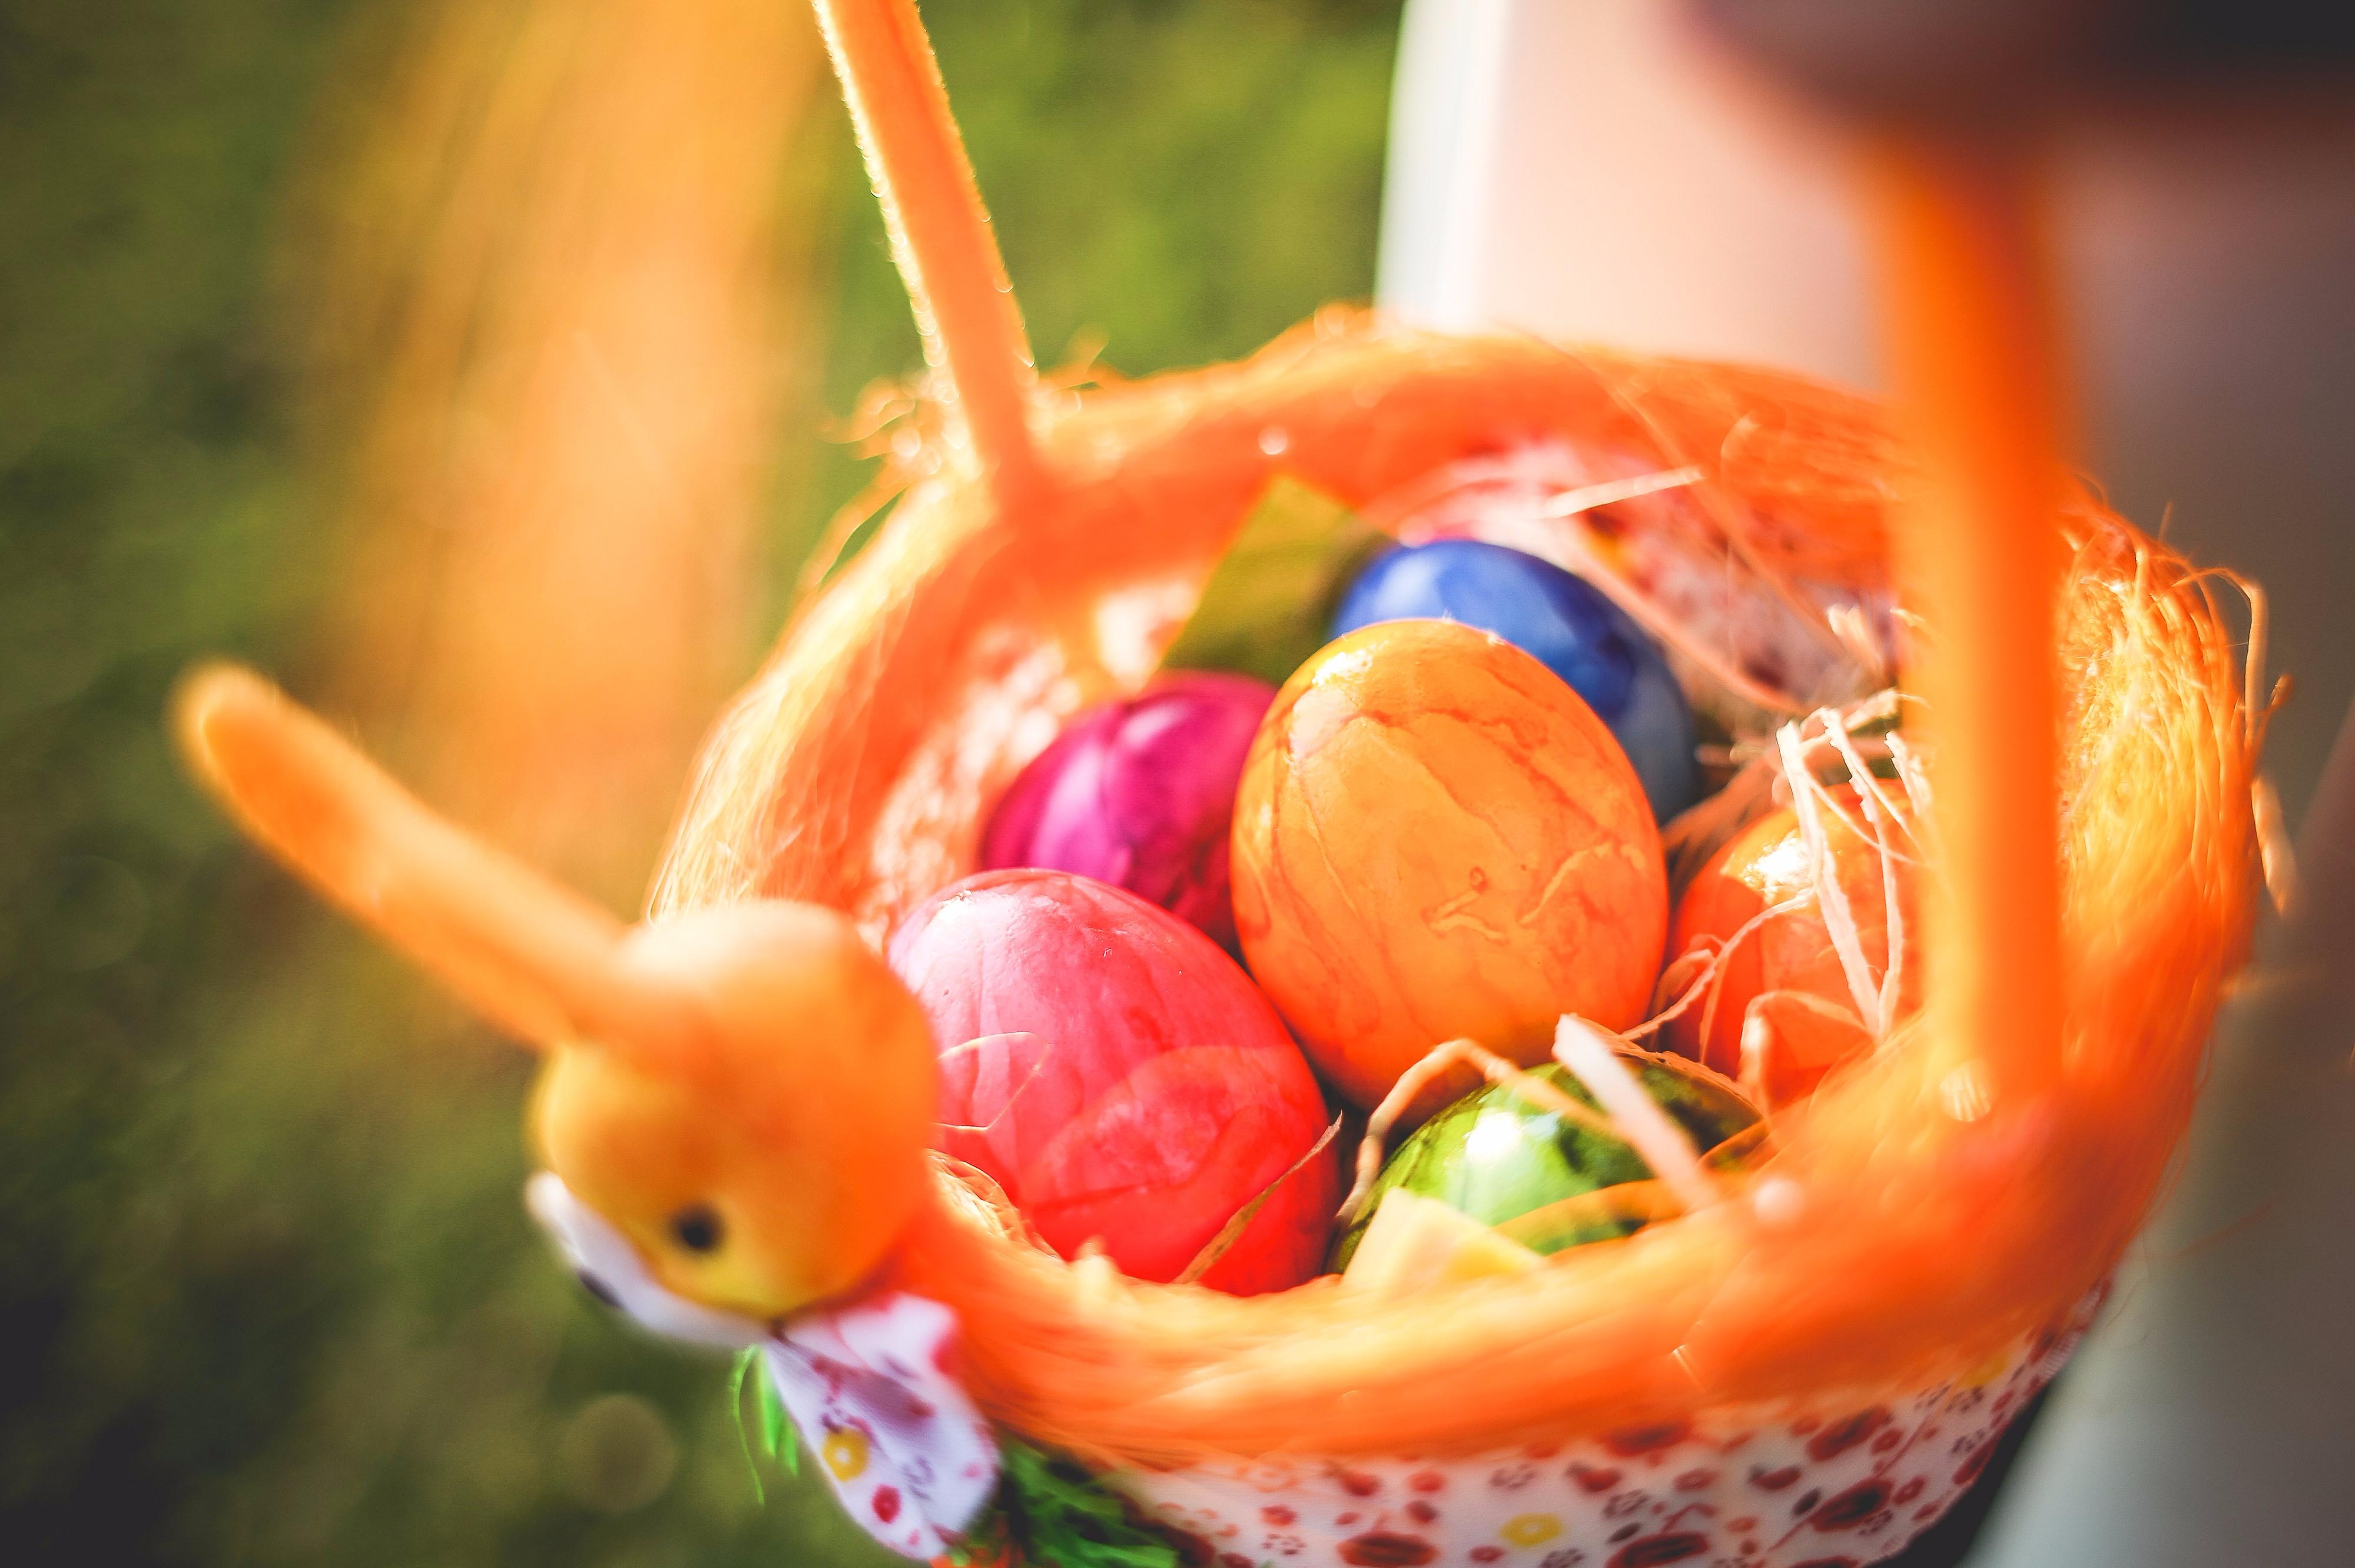 colorful-easter-eggs-picjumbo-com (1)